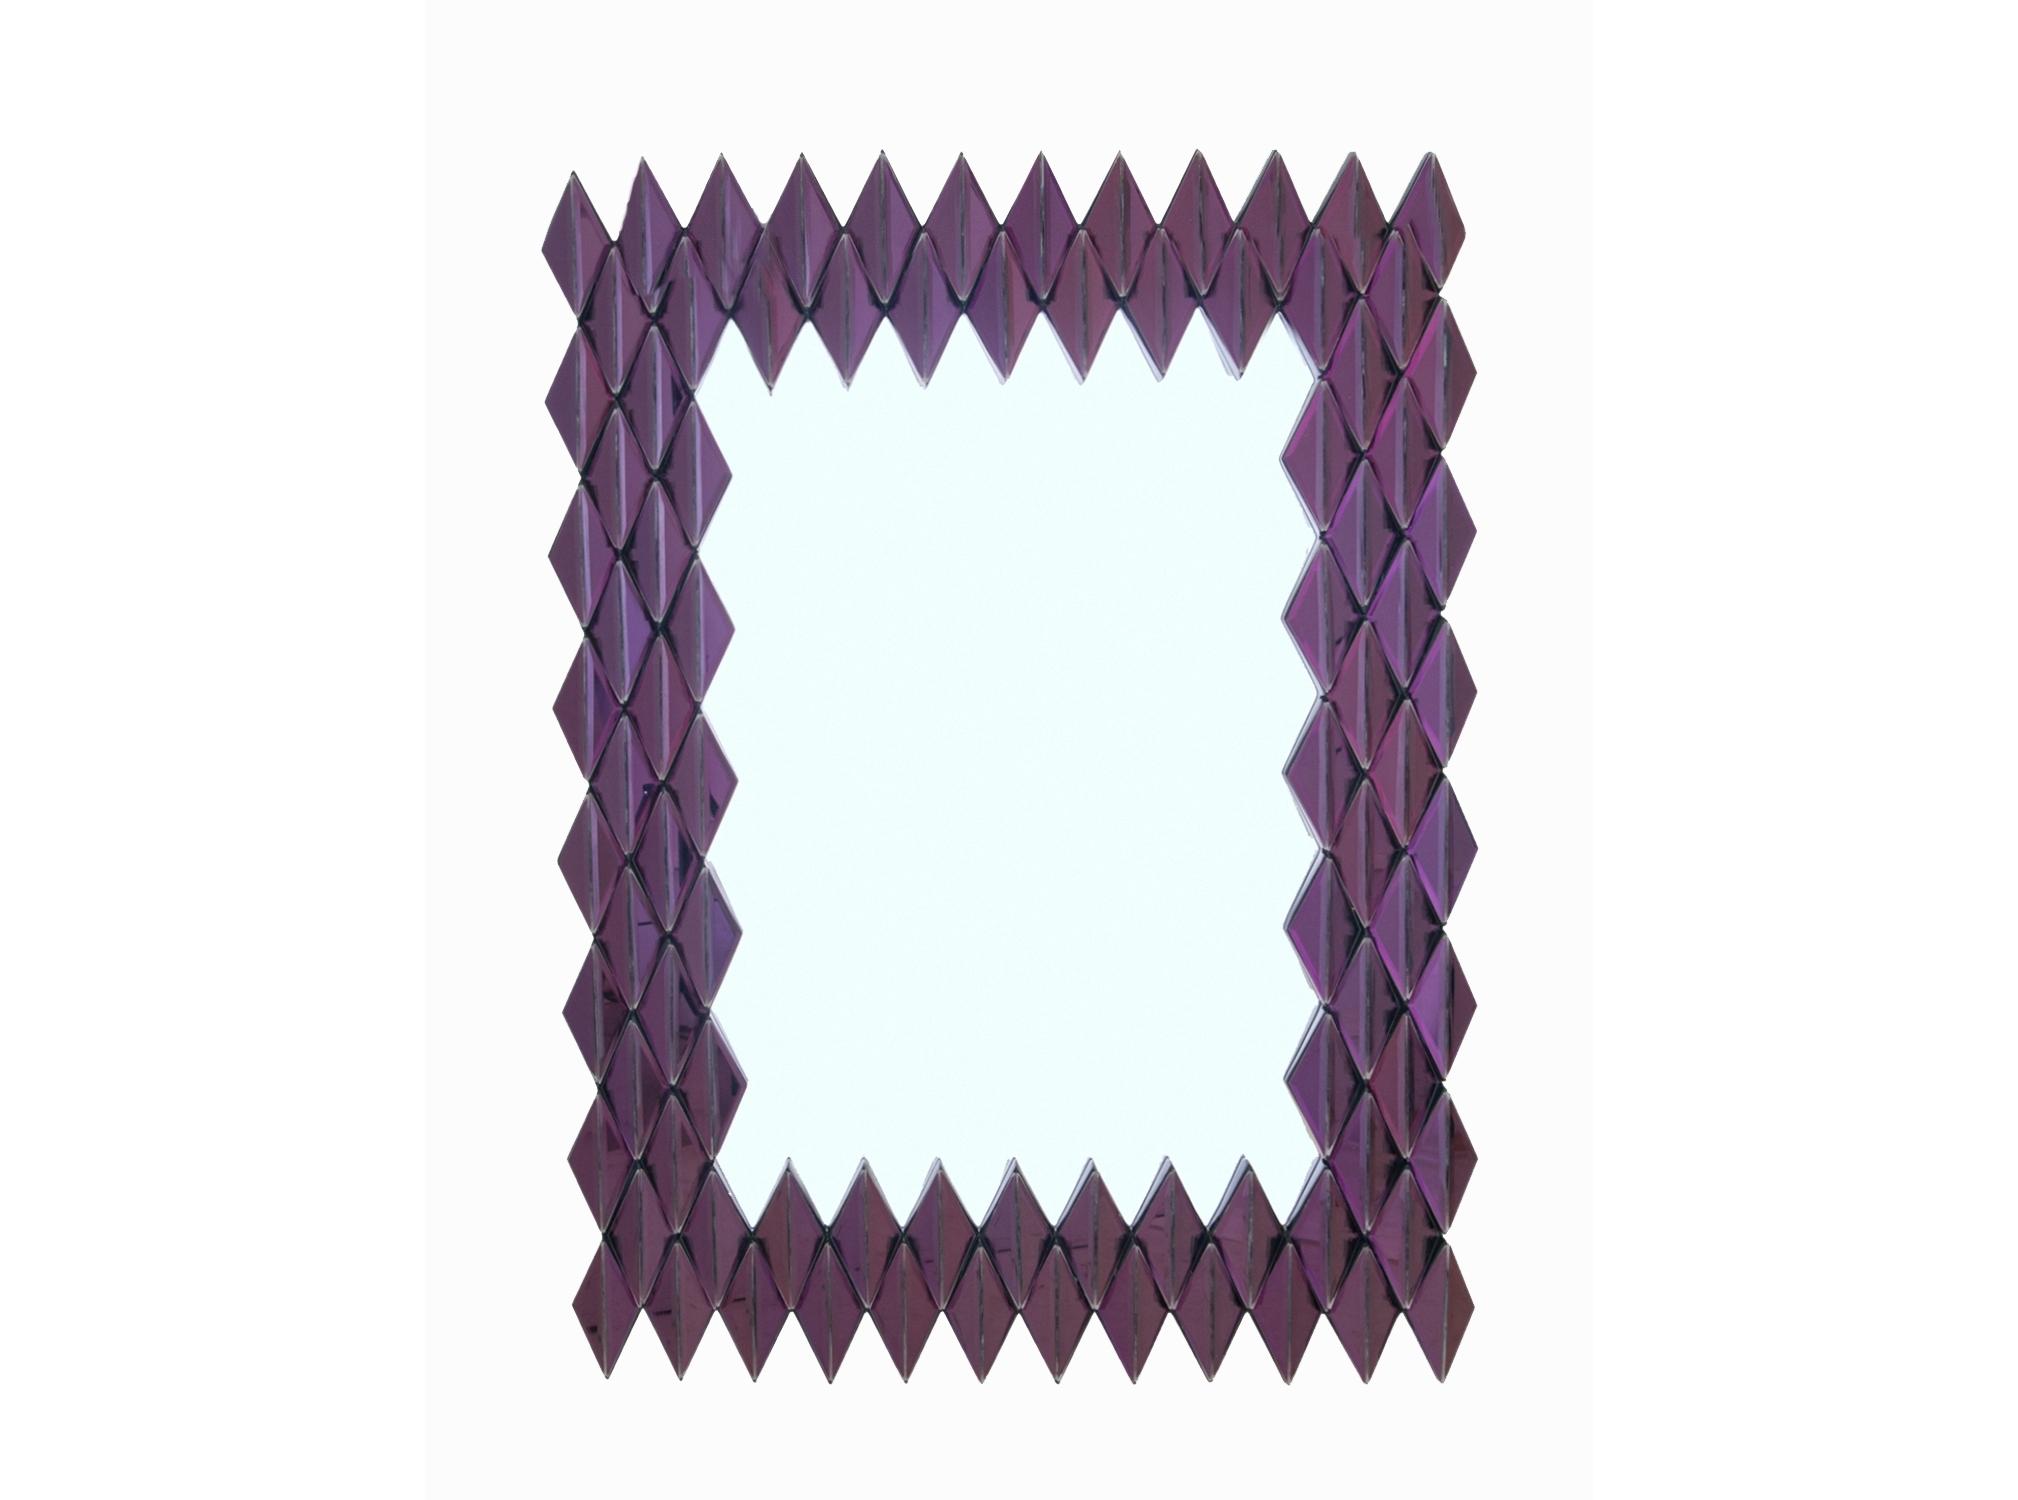 Зеркало LeronНастенные зеркала<br><br><br>Material: Металл<br>Width см: 75<br>Depth см: 3,7<br>Height см: 100